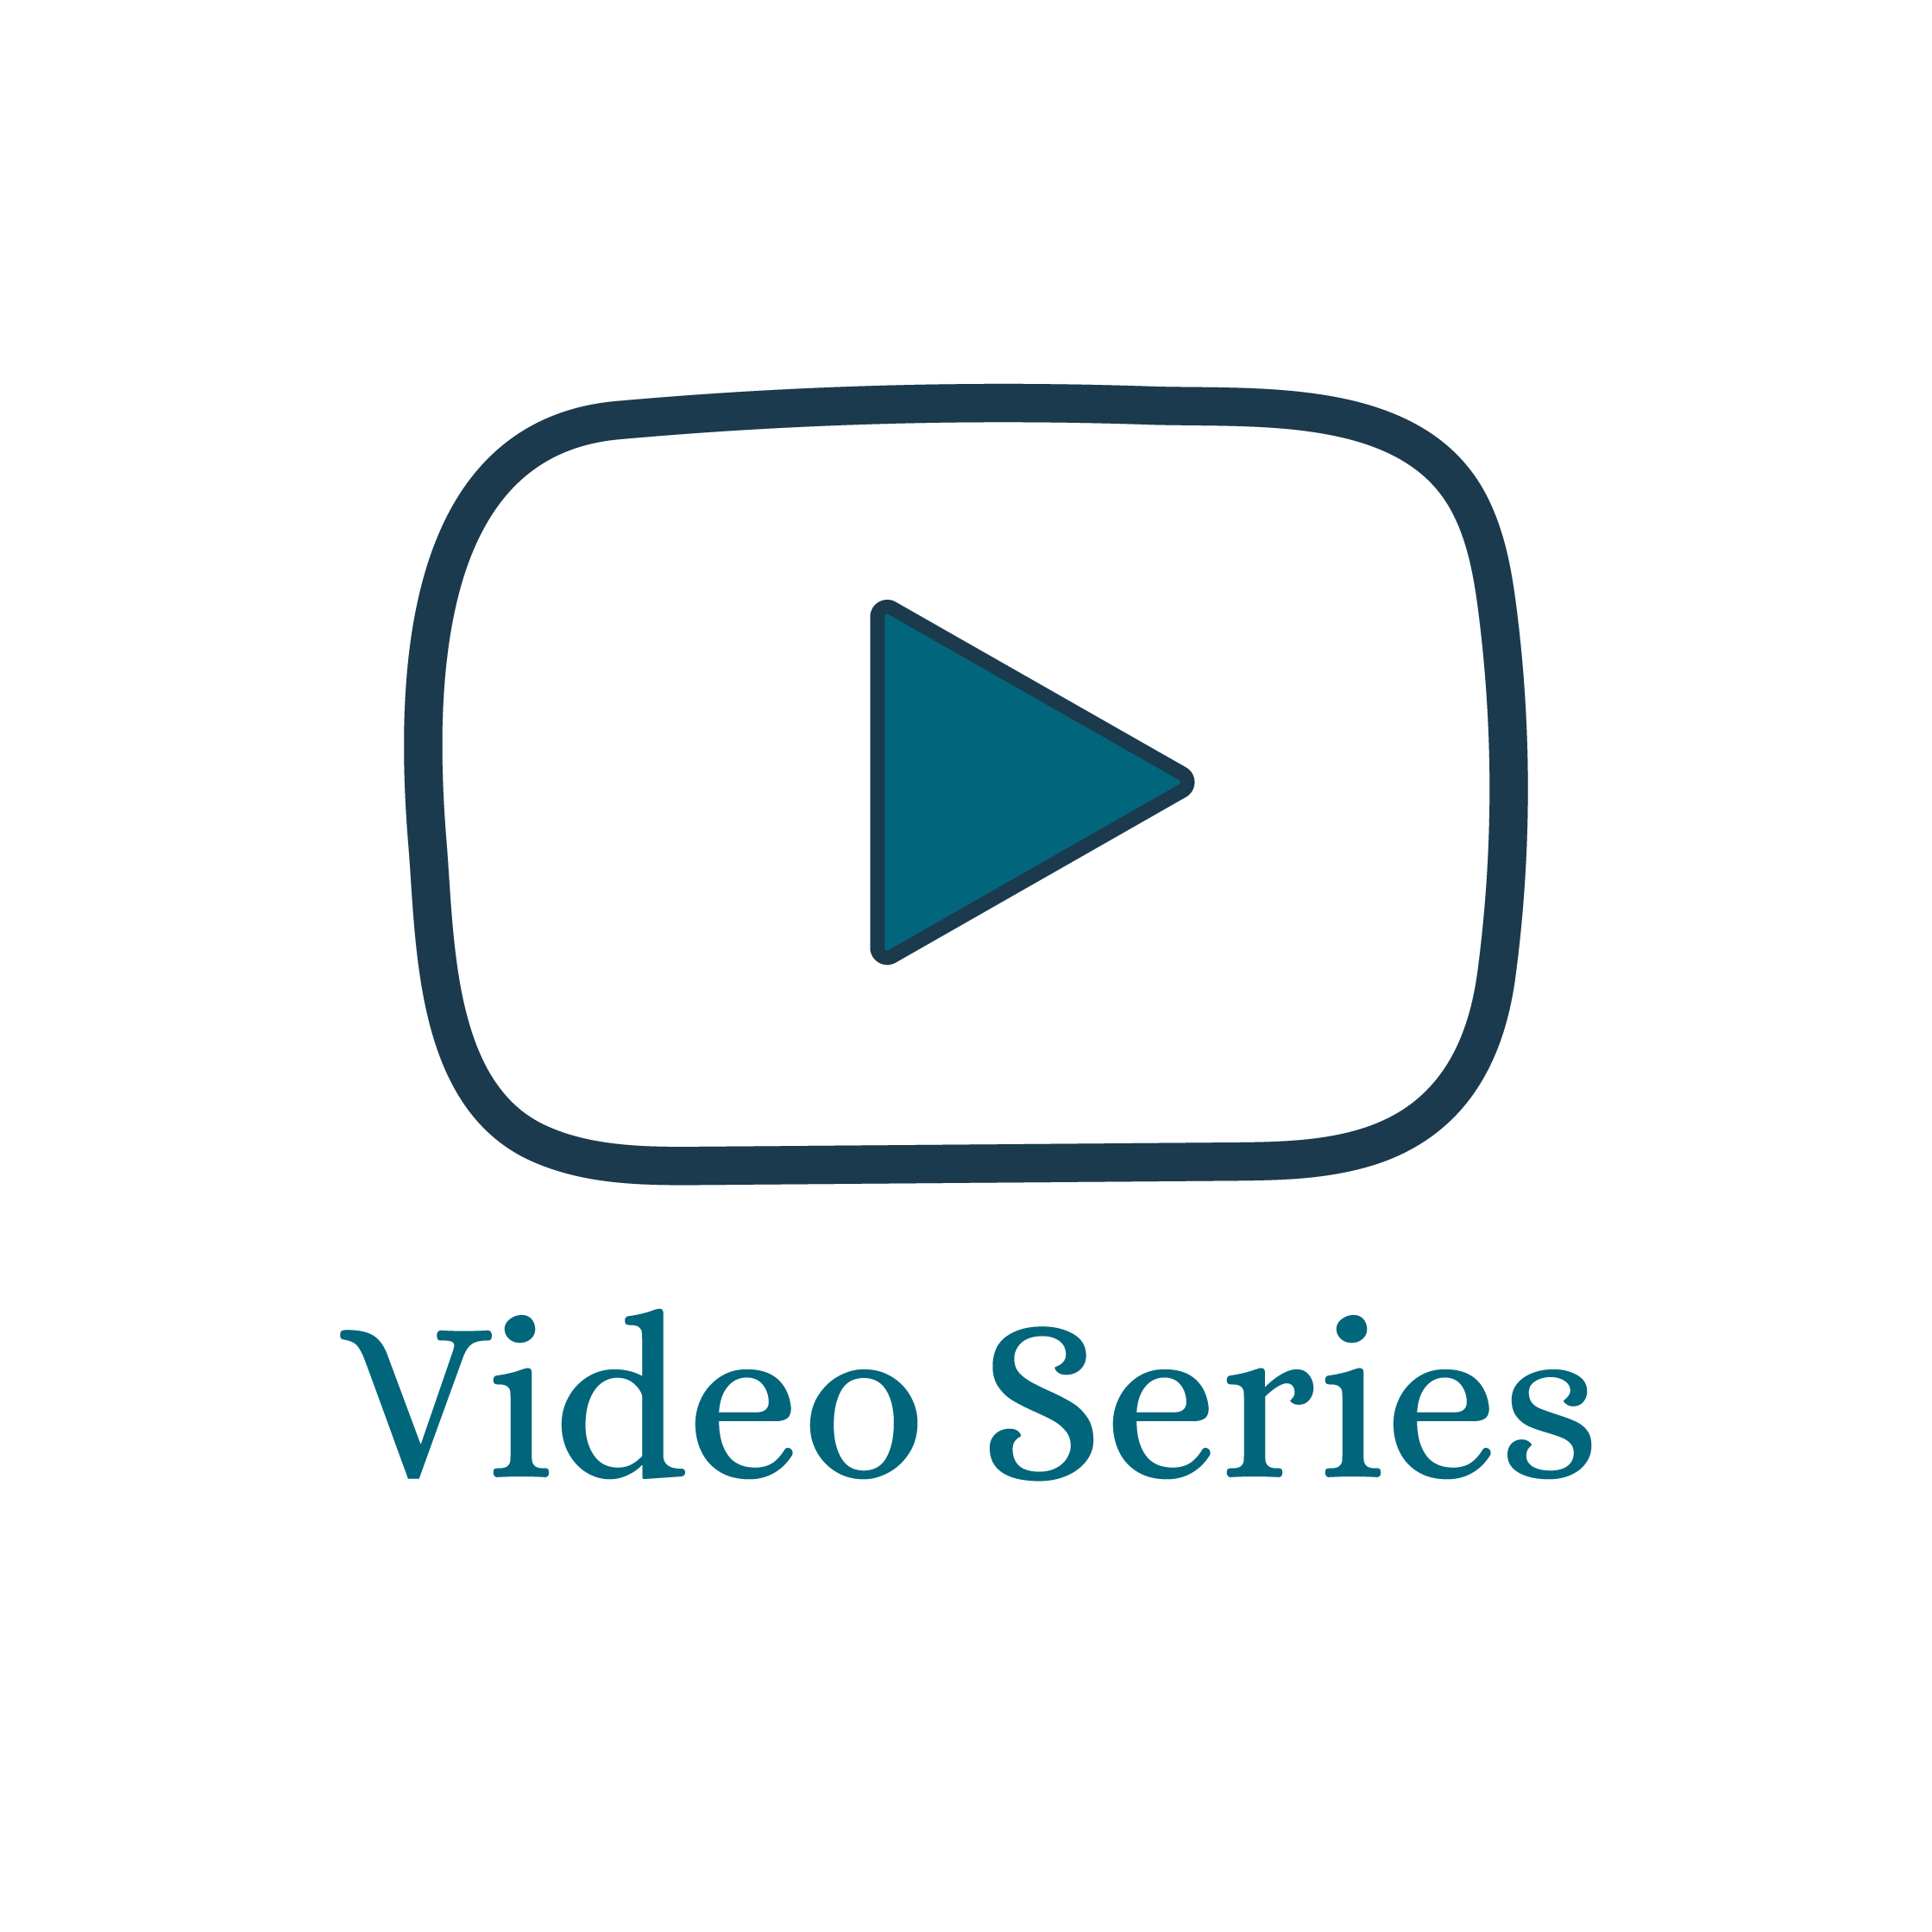 mc video series-01.png